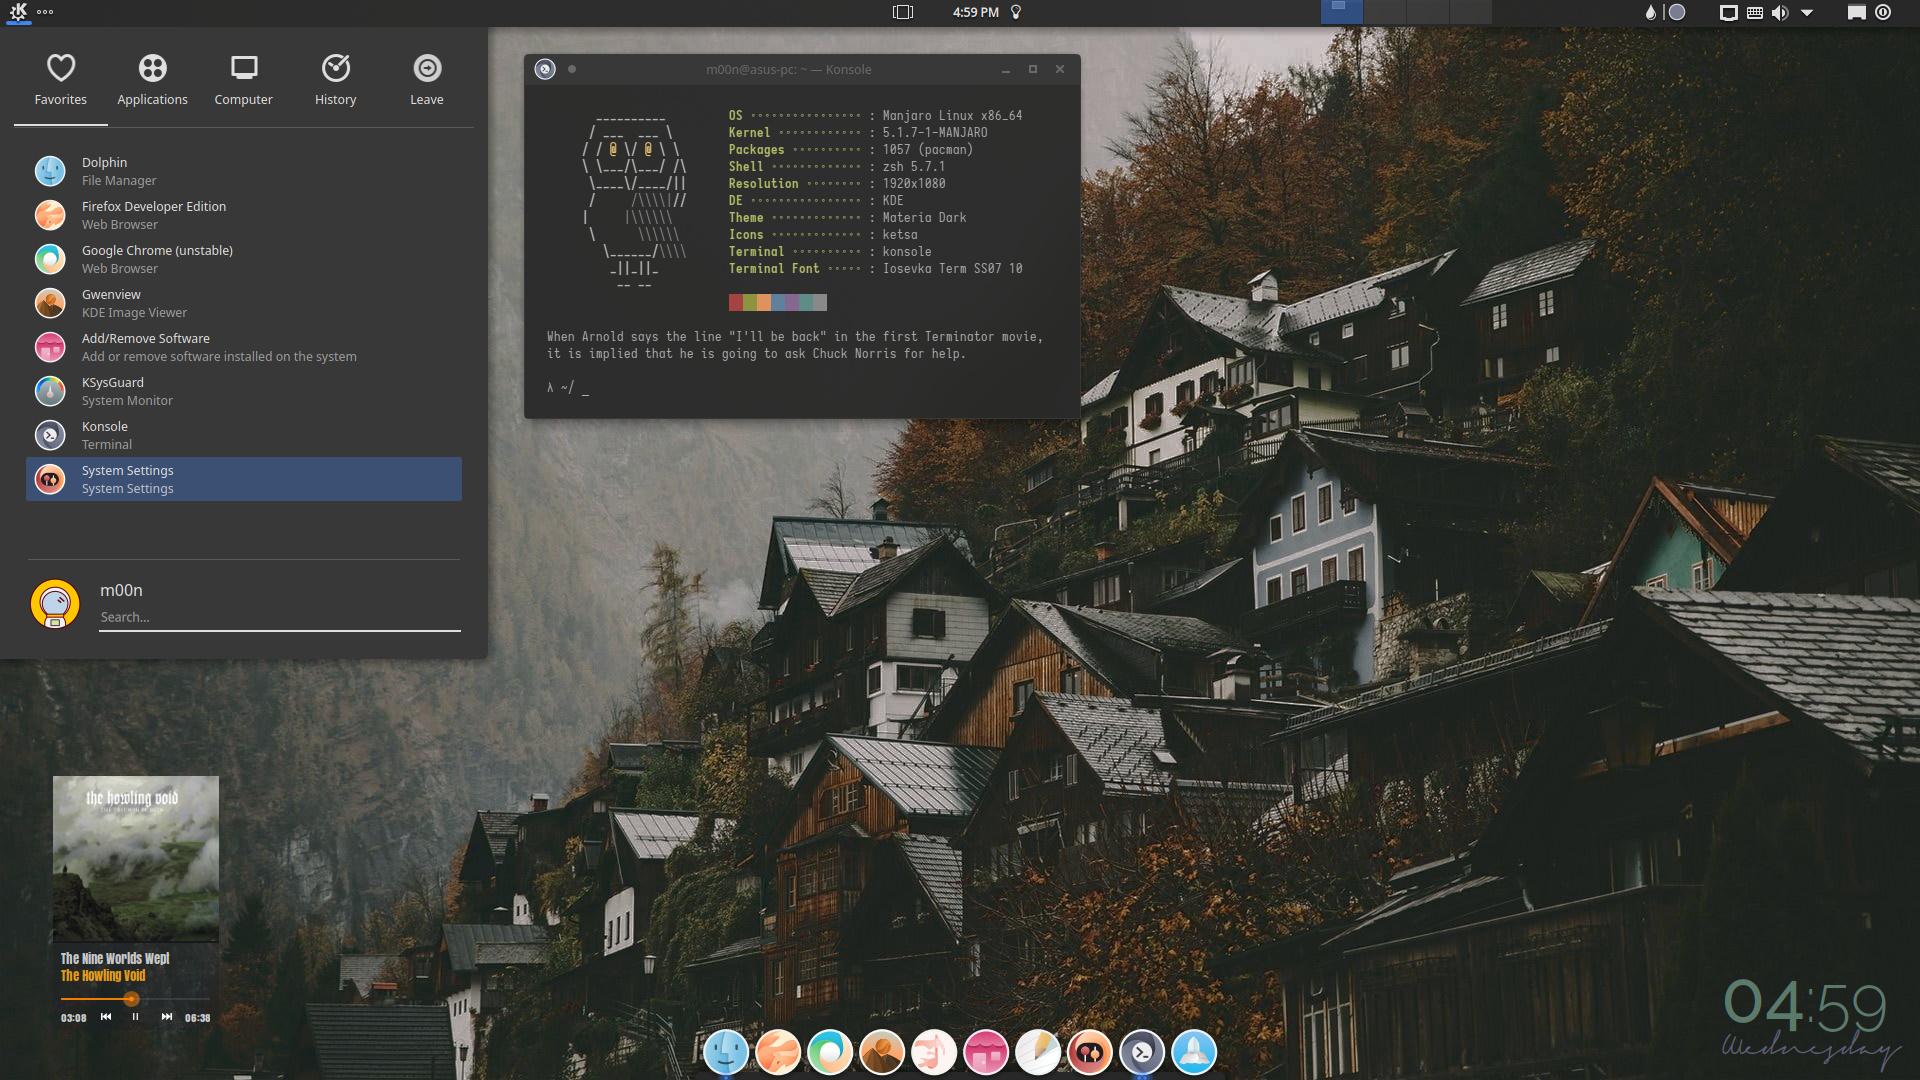 June 2019 Screenshot Thread - Artwork - ArchLabs Linux